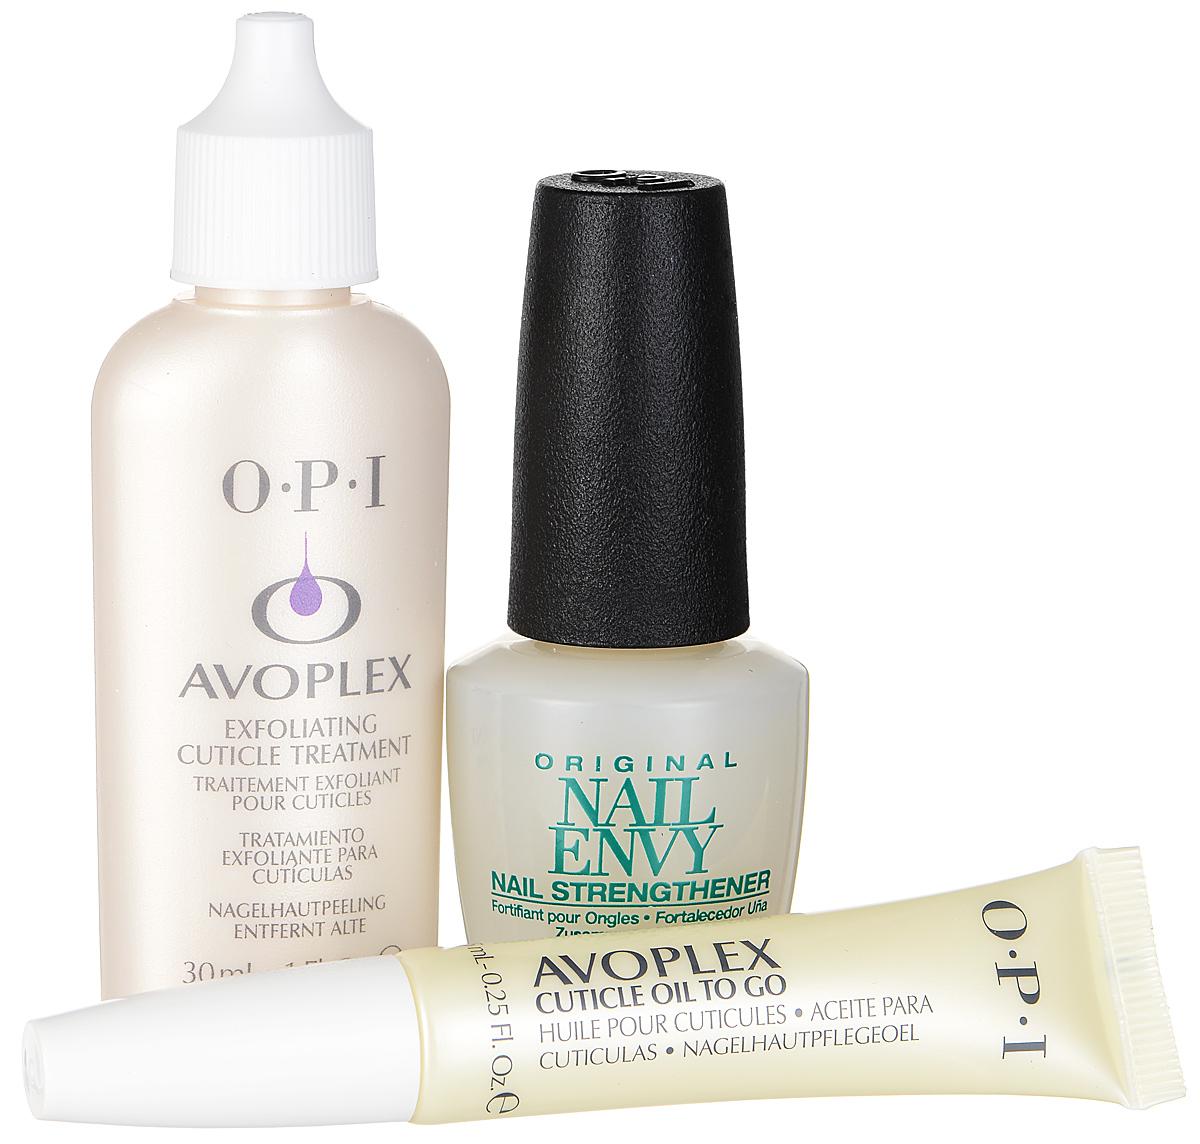 OPI Набор The Royal Mani: средство для кутикулы Avoplex, размягчающее, универсальное средство для ногтей Nail Envy, укрепляющее, масло для кутикулы Avoplex